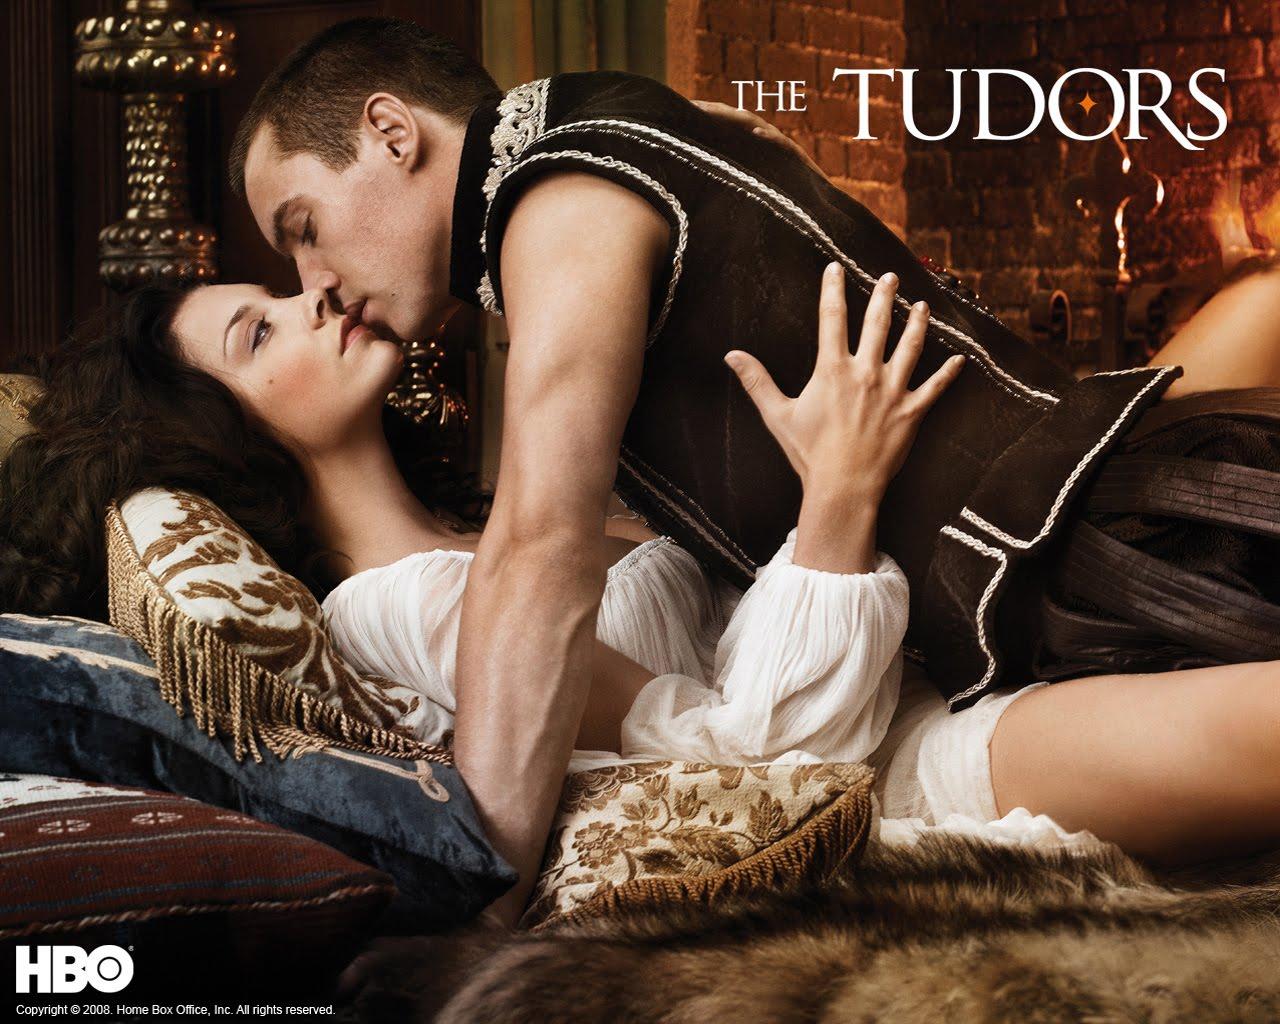 http://2.bp.blogspot.com/_WAe8k-_nMMA/SwedZi5KdII/AAAAAAAAADI/kAOONBMrpRs/s1600/Movies_Films_T_The_Tudors_010662_.jpg